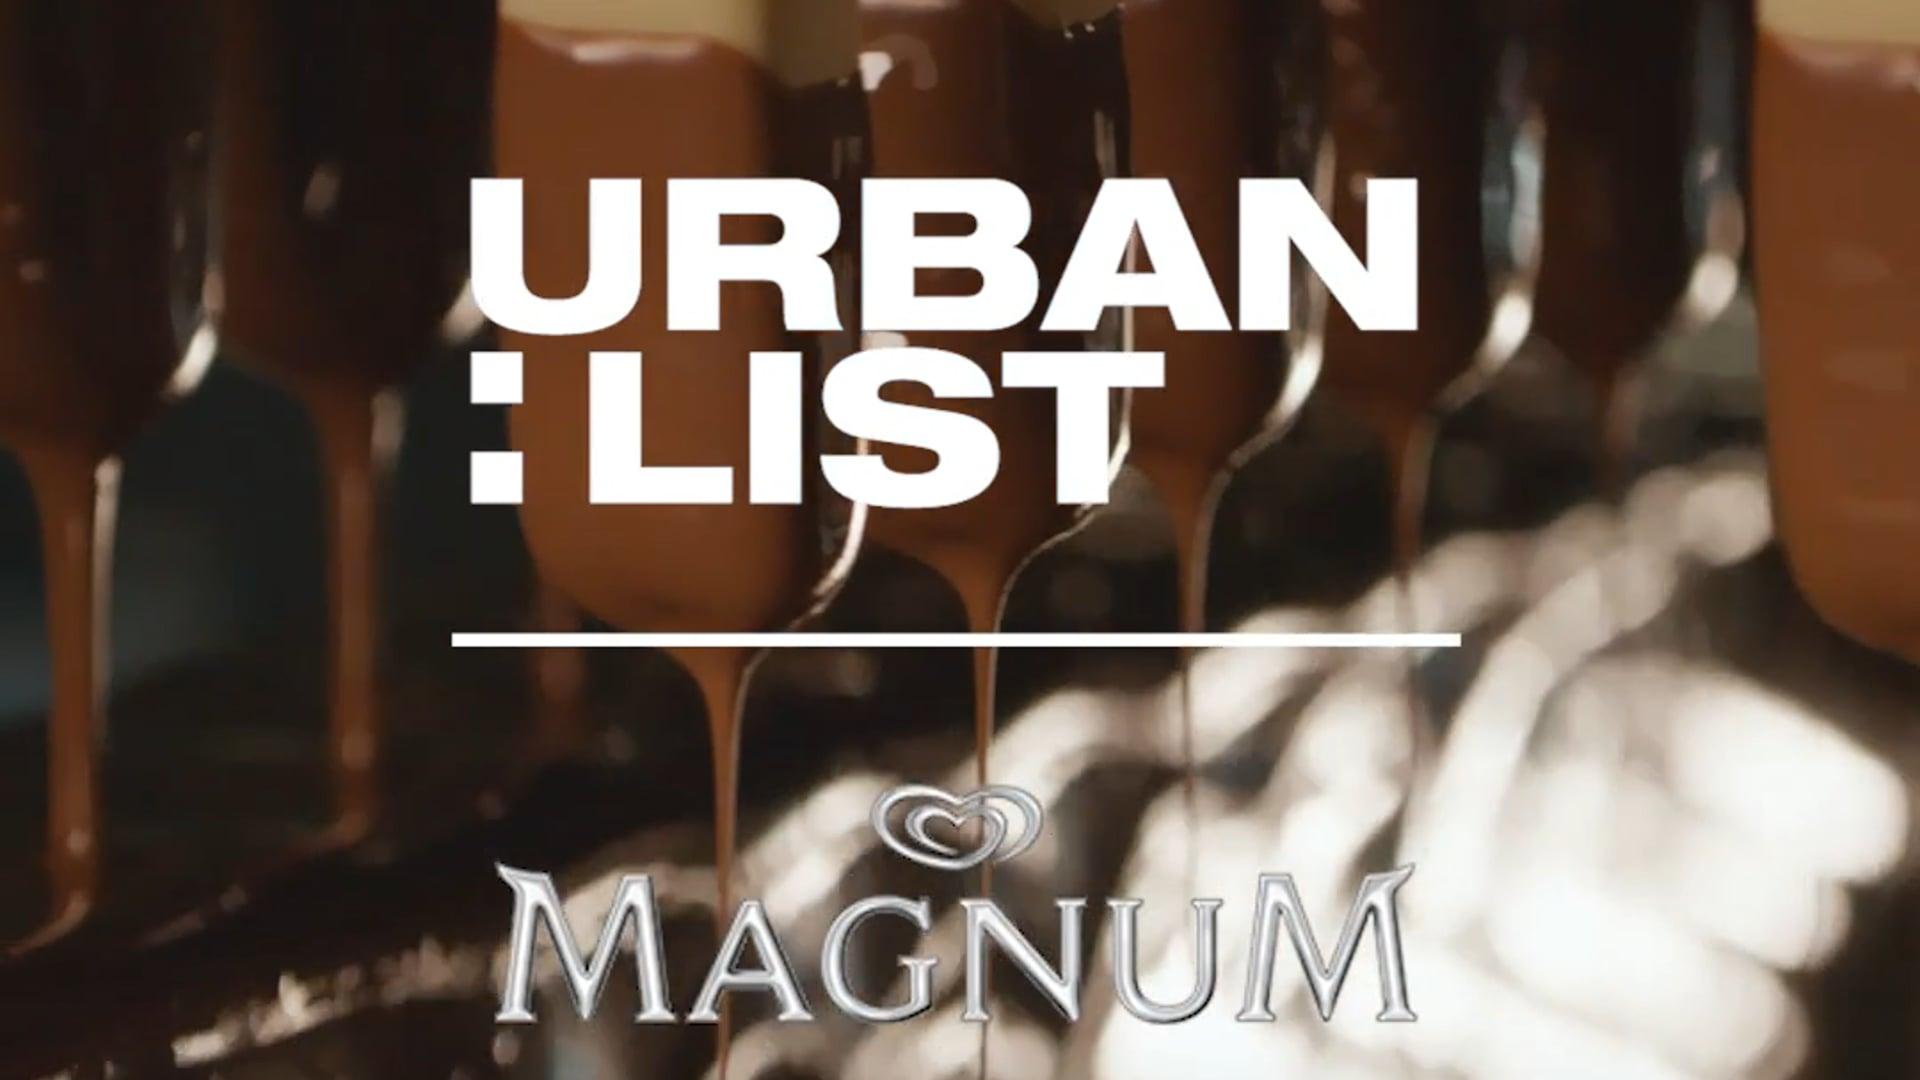 Urban List - Magnum